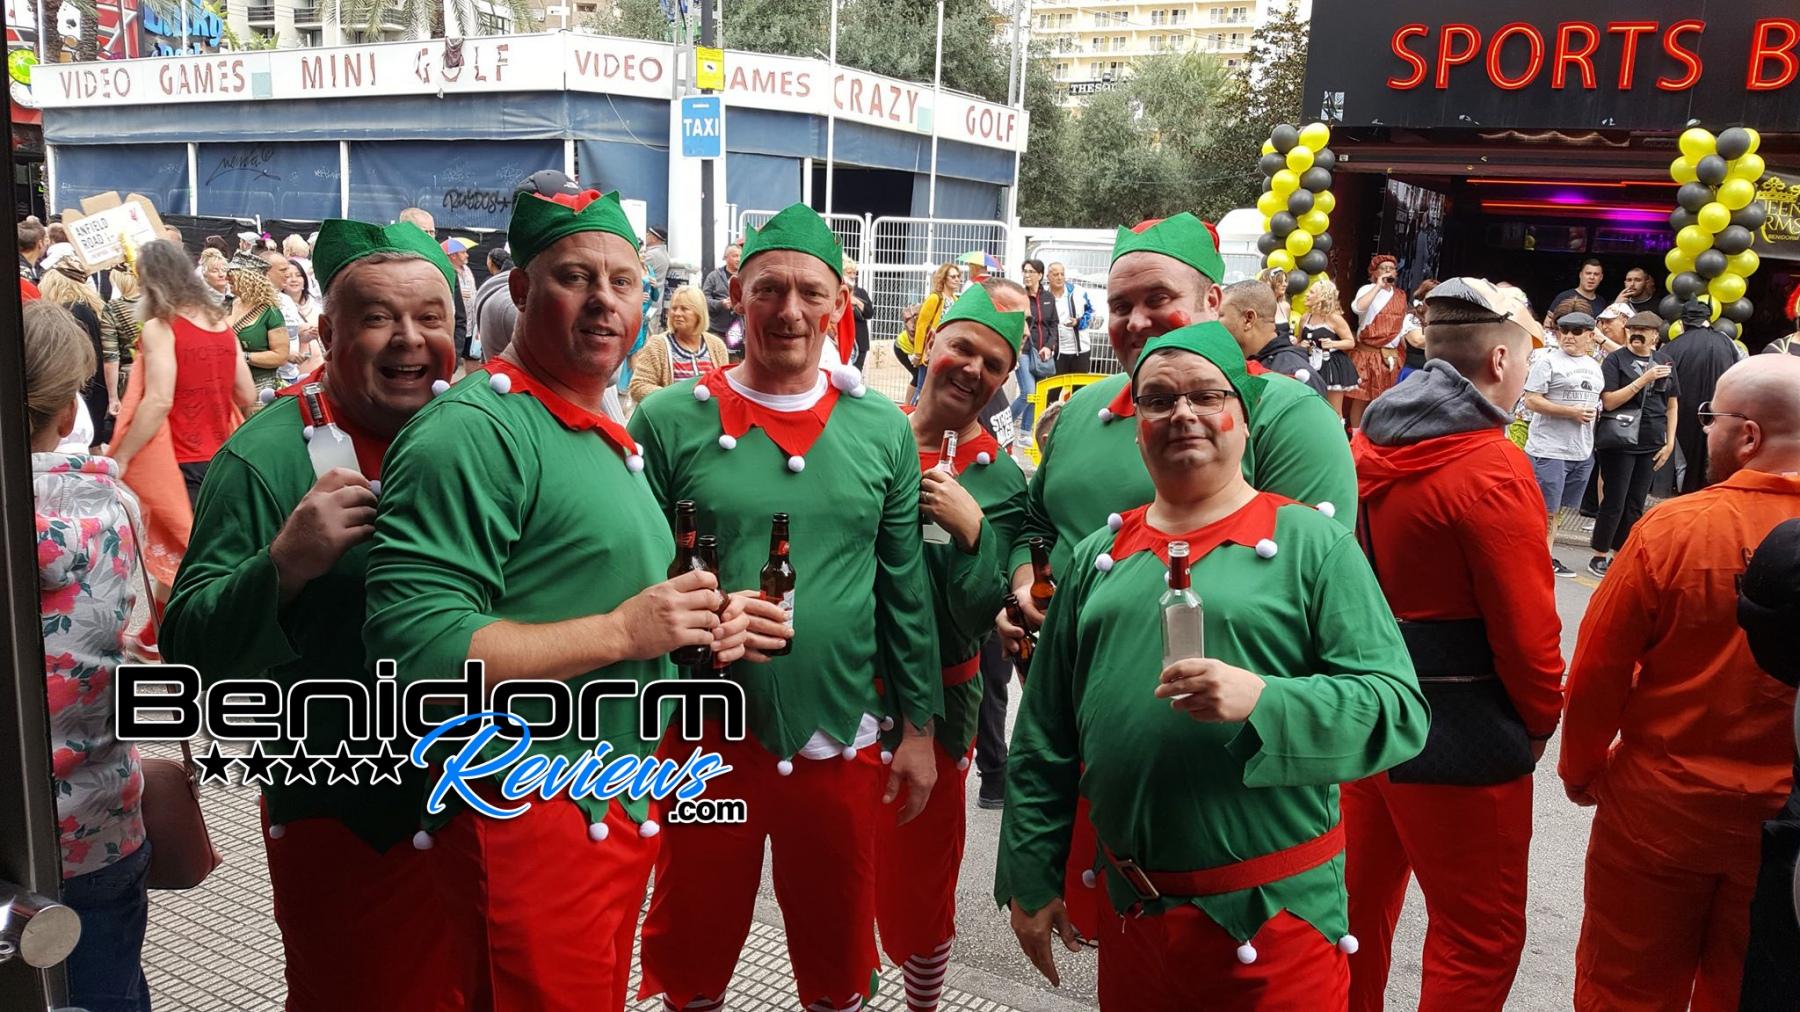 Benidorm-Fiestas-2019-Fancy-Dress-247